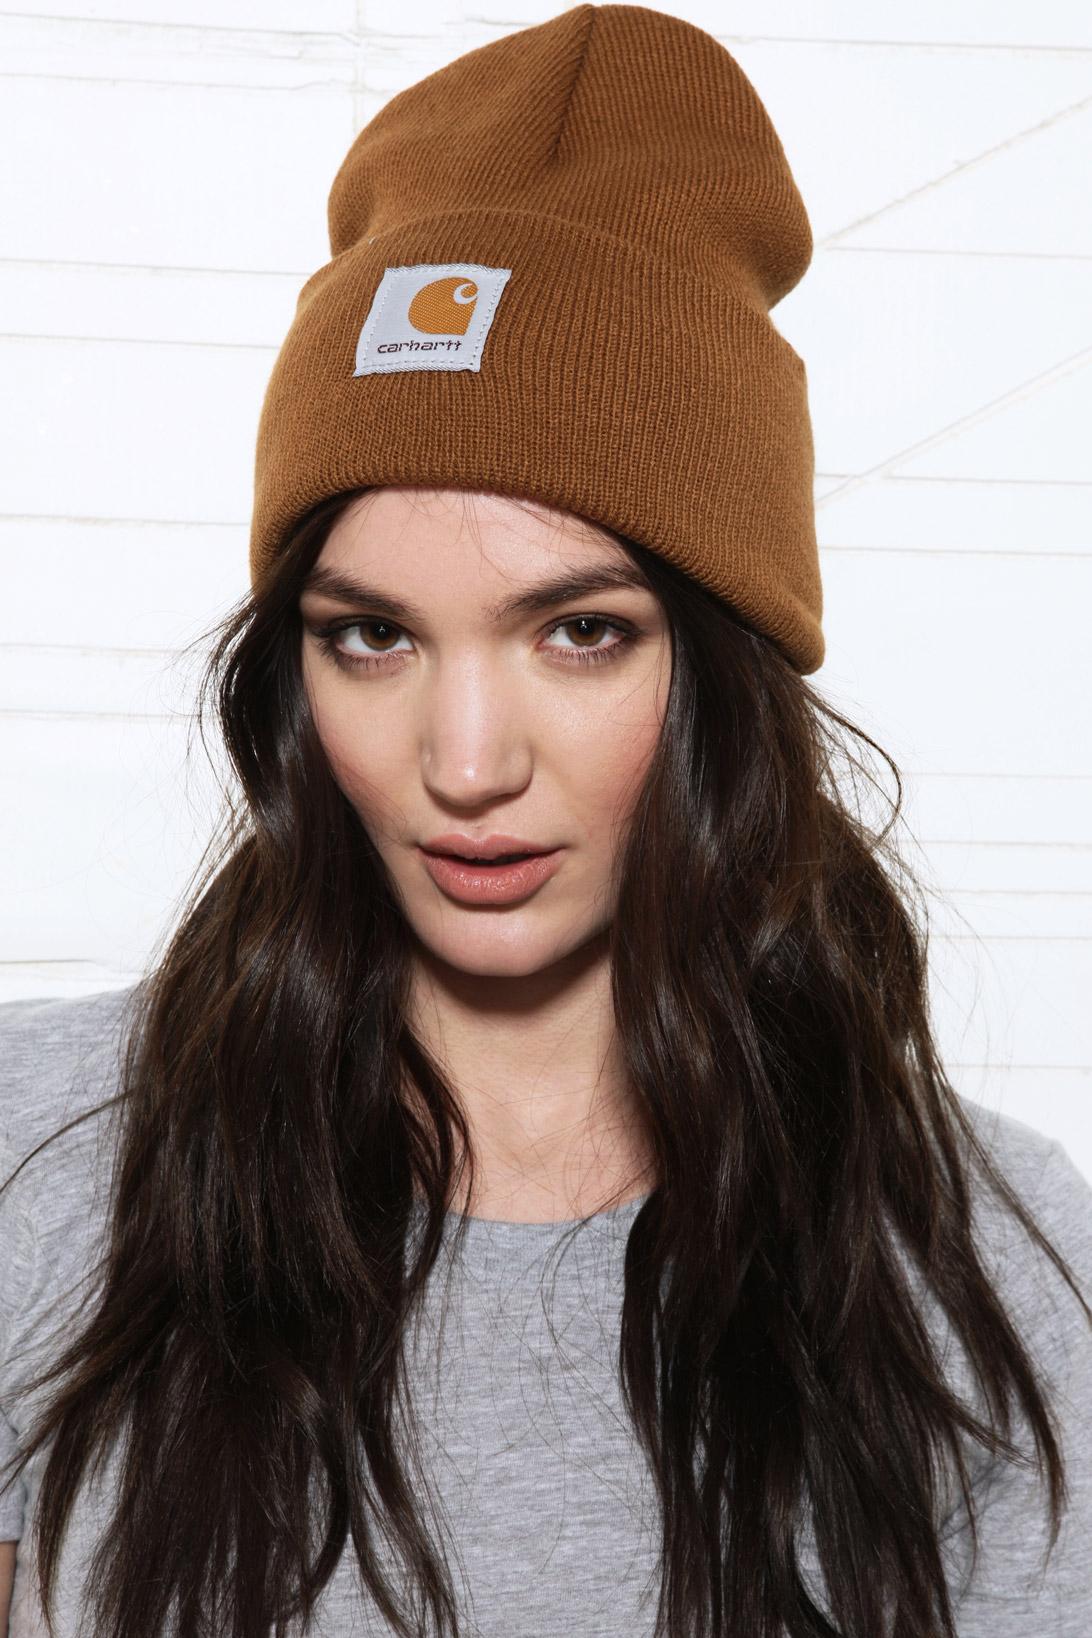 c2f9ebba4df1a Carhartt Watch Beanie Hat in Brown in Brown - Lyst women s carhartt beanie